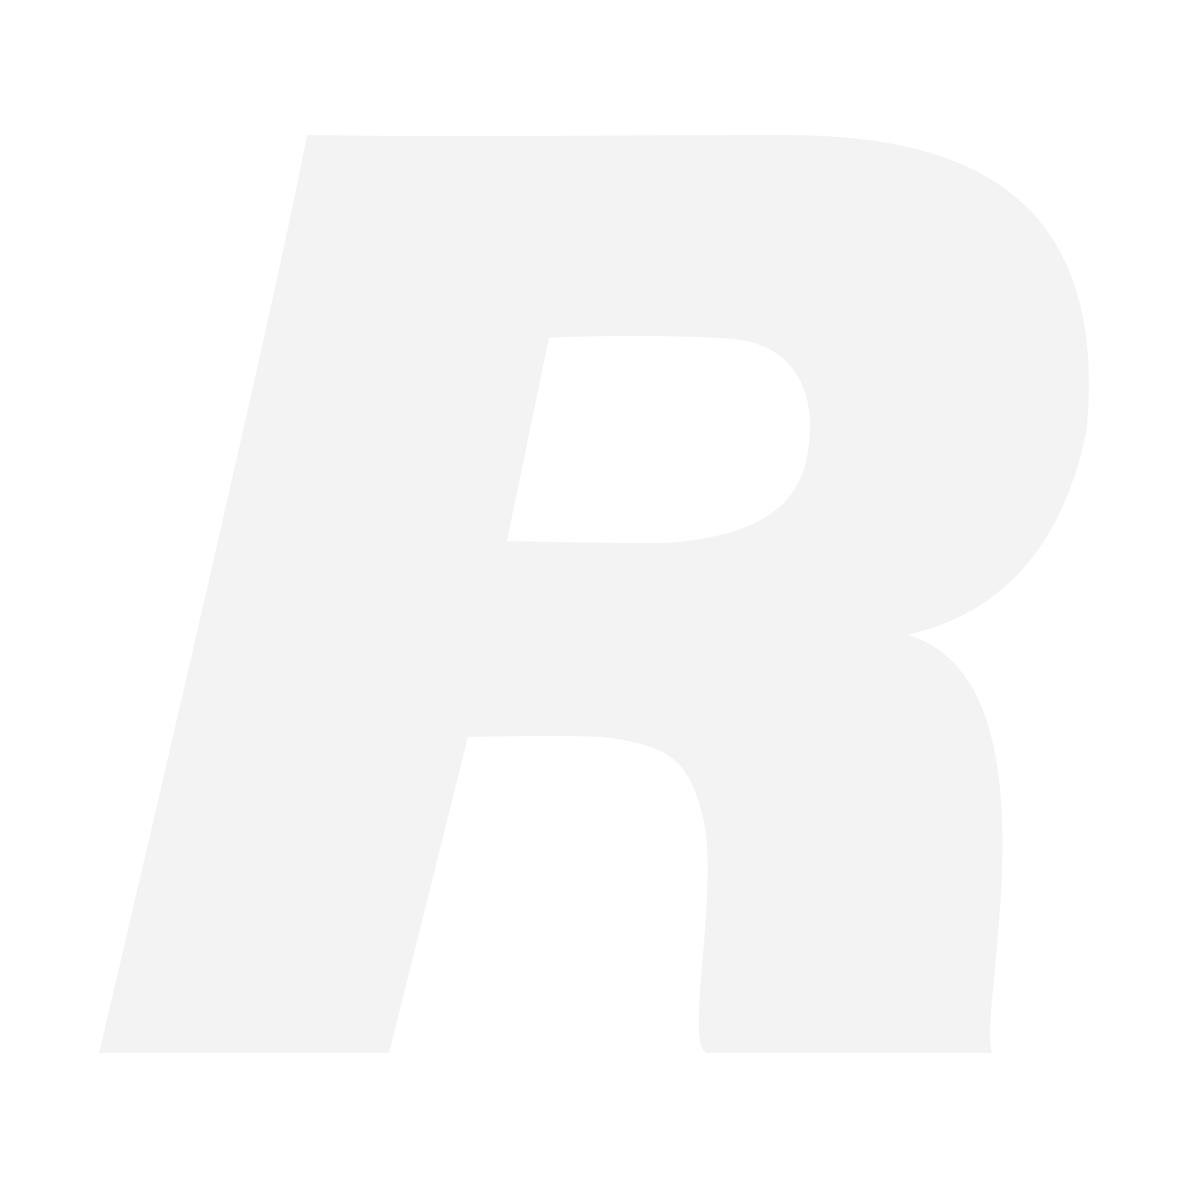 Sony RM-VPR1 Remote Commander